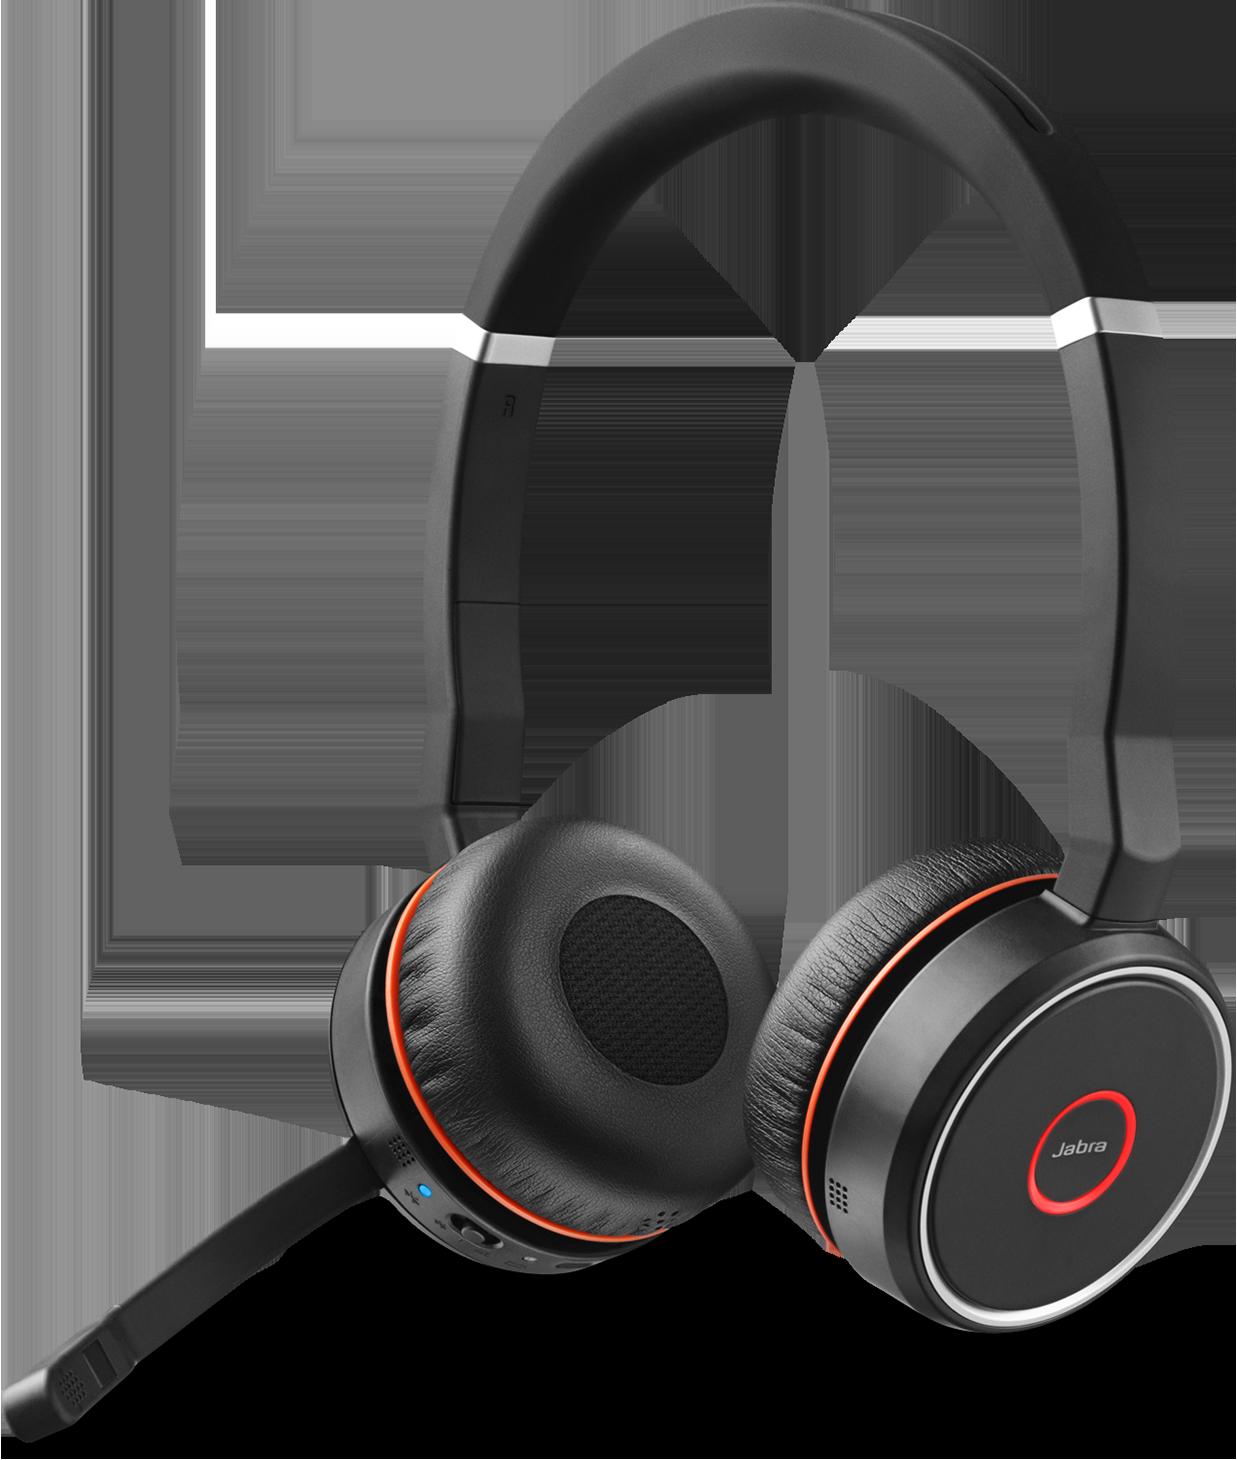 24c0d2ca726 Jabra Evolve 75 Wireless Headset (615822009423 Uncategorized) photo